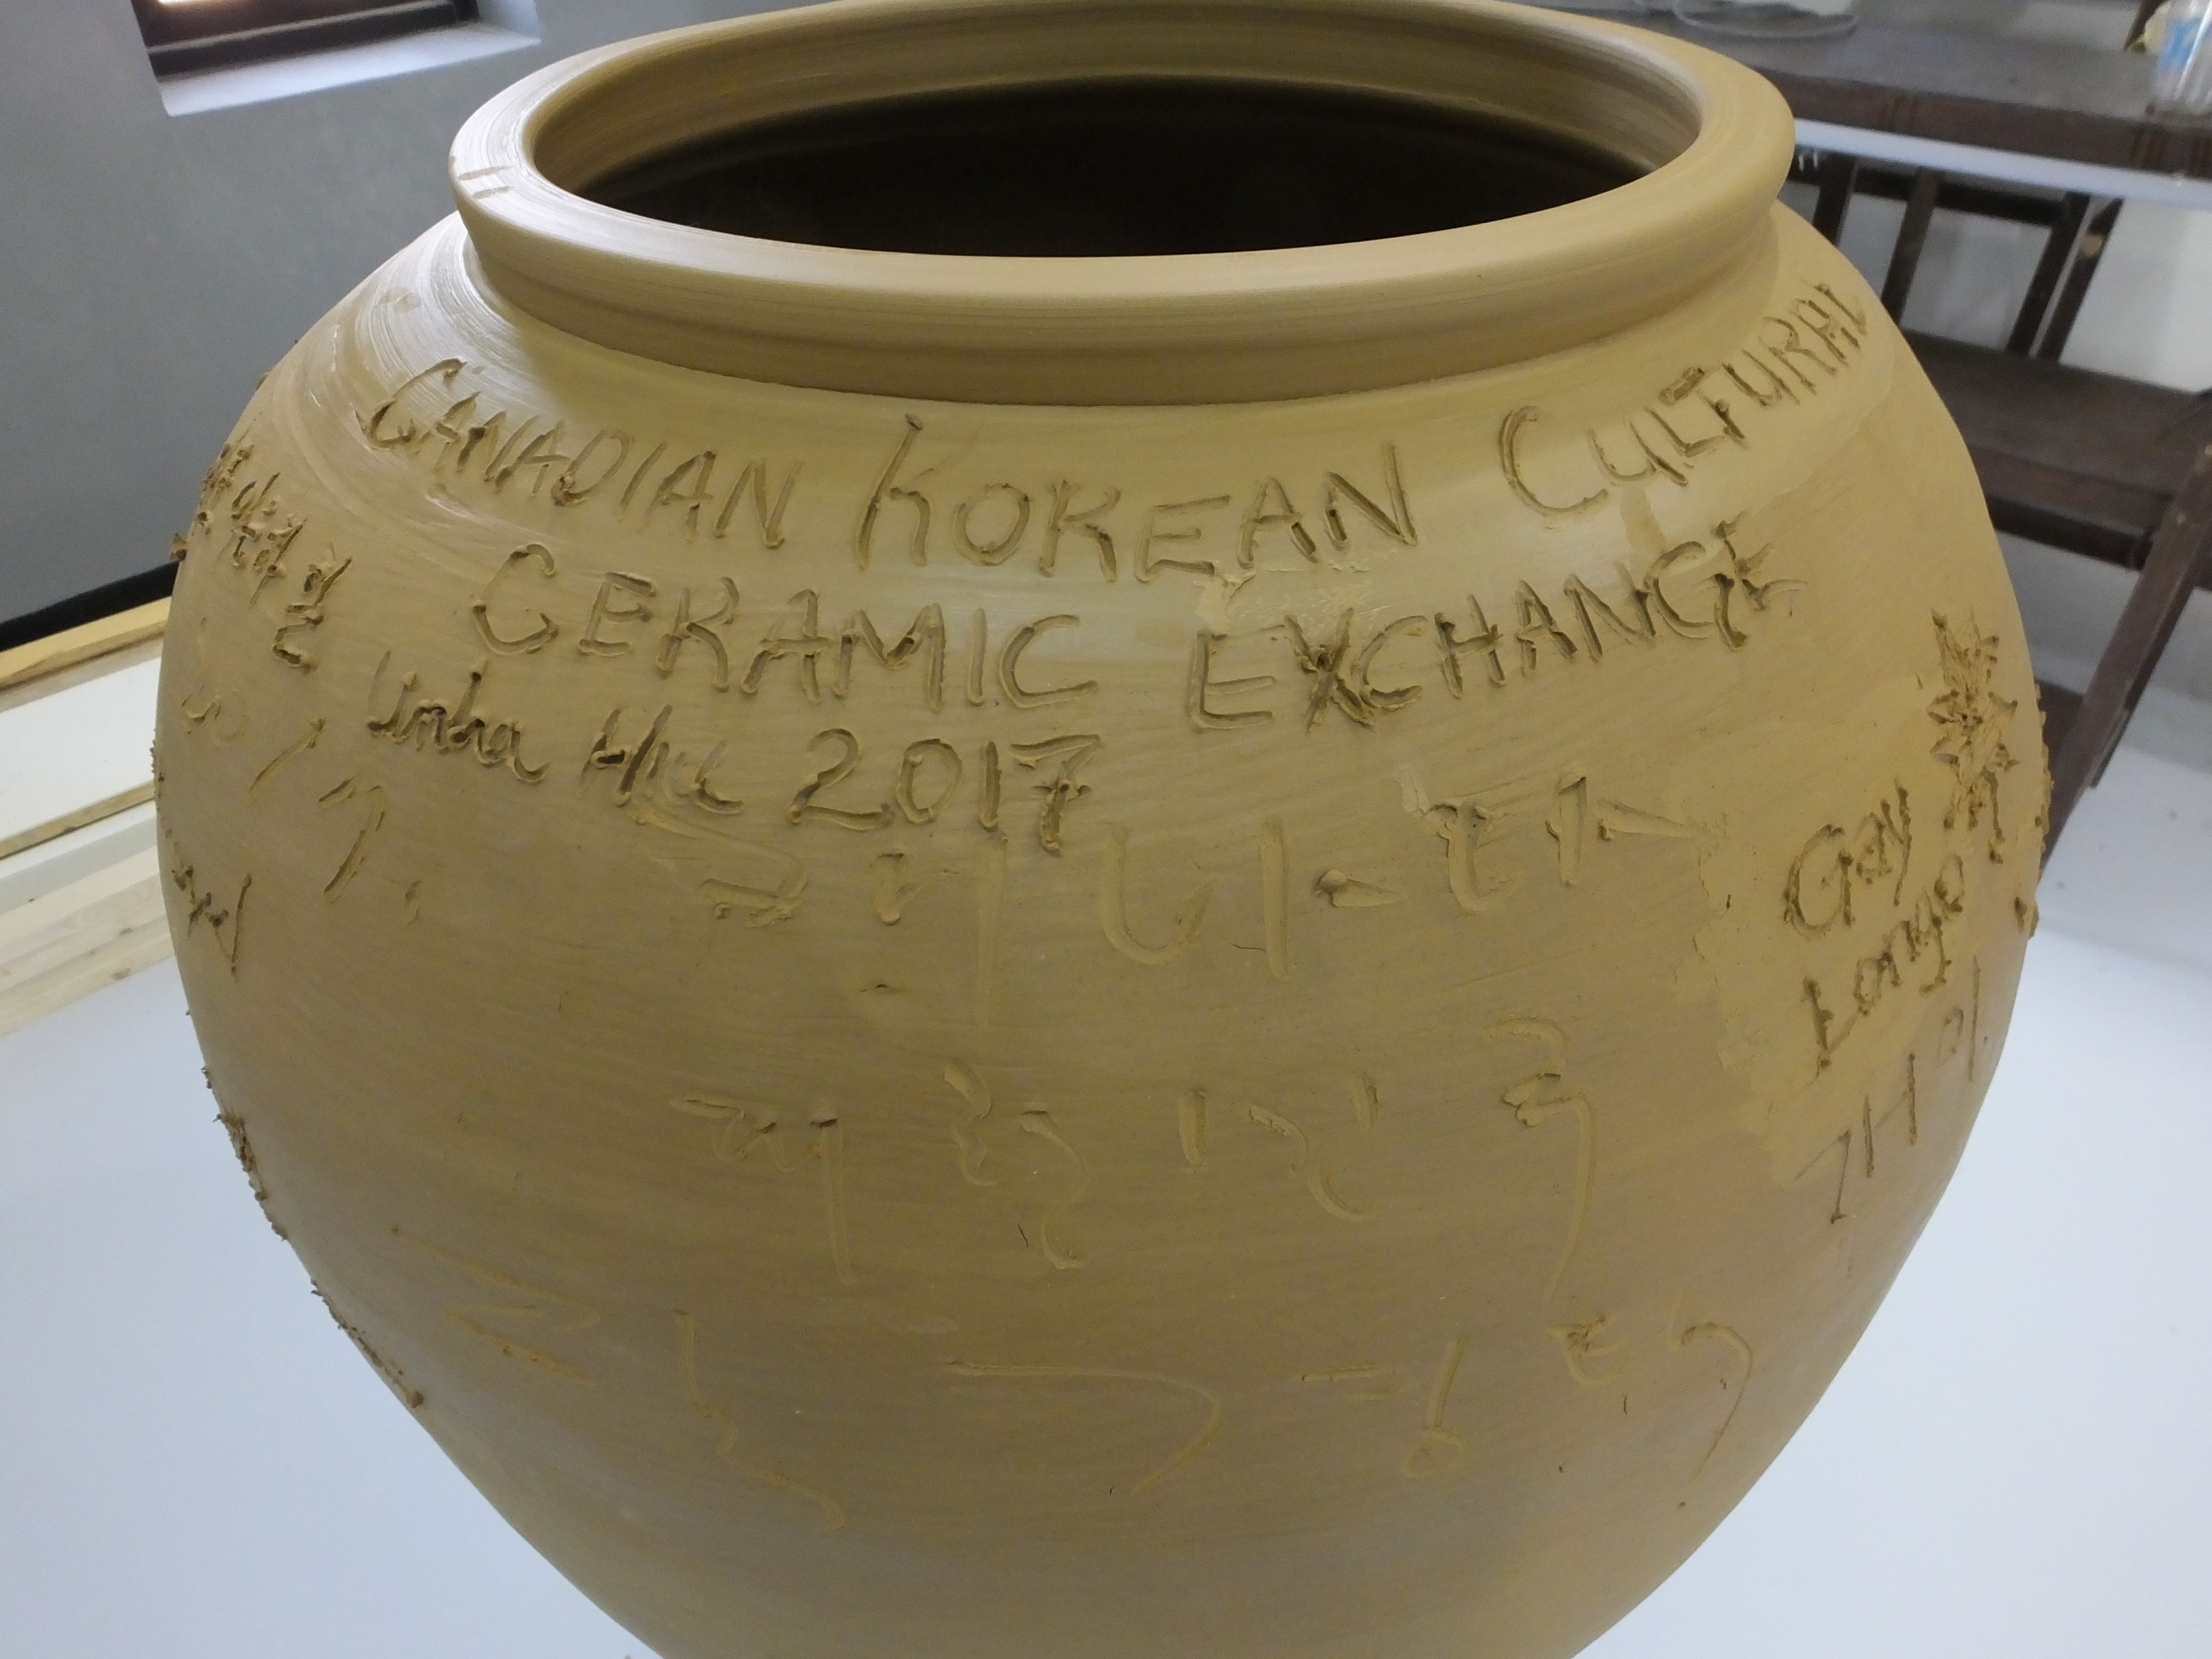 The group made vase/urn